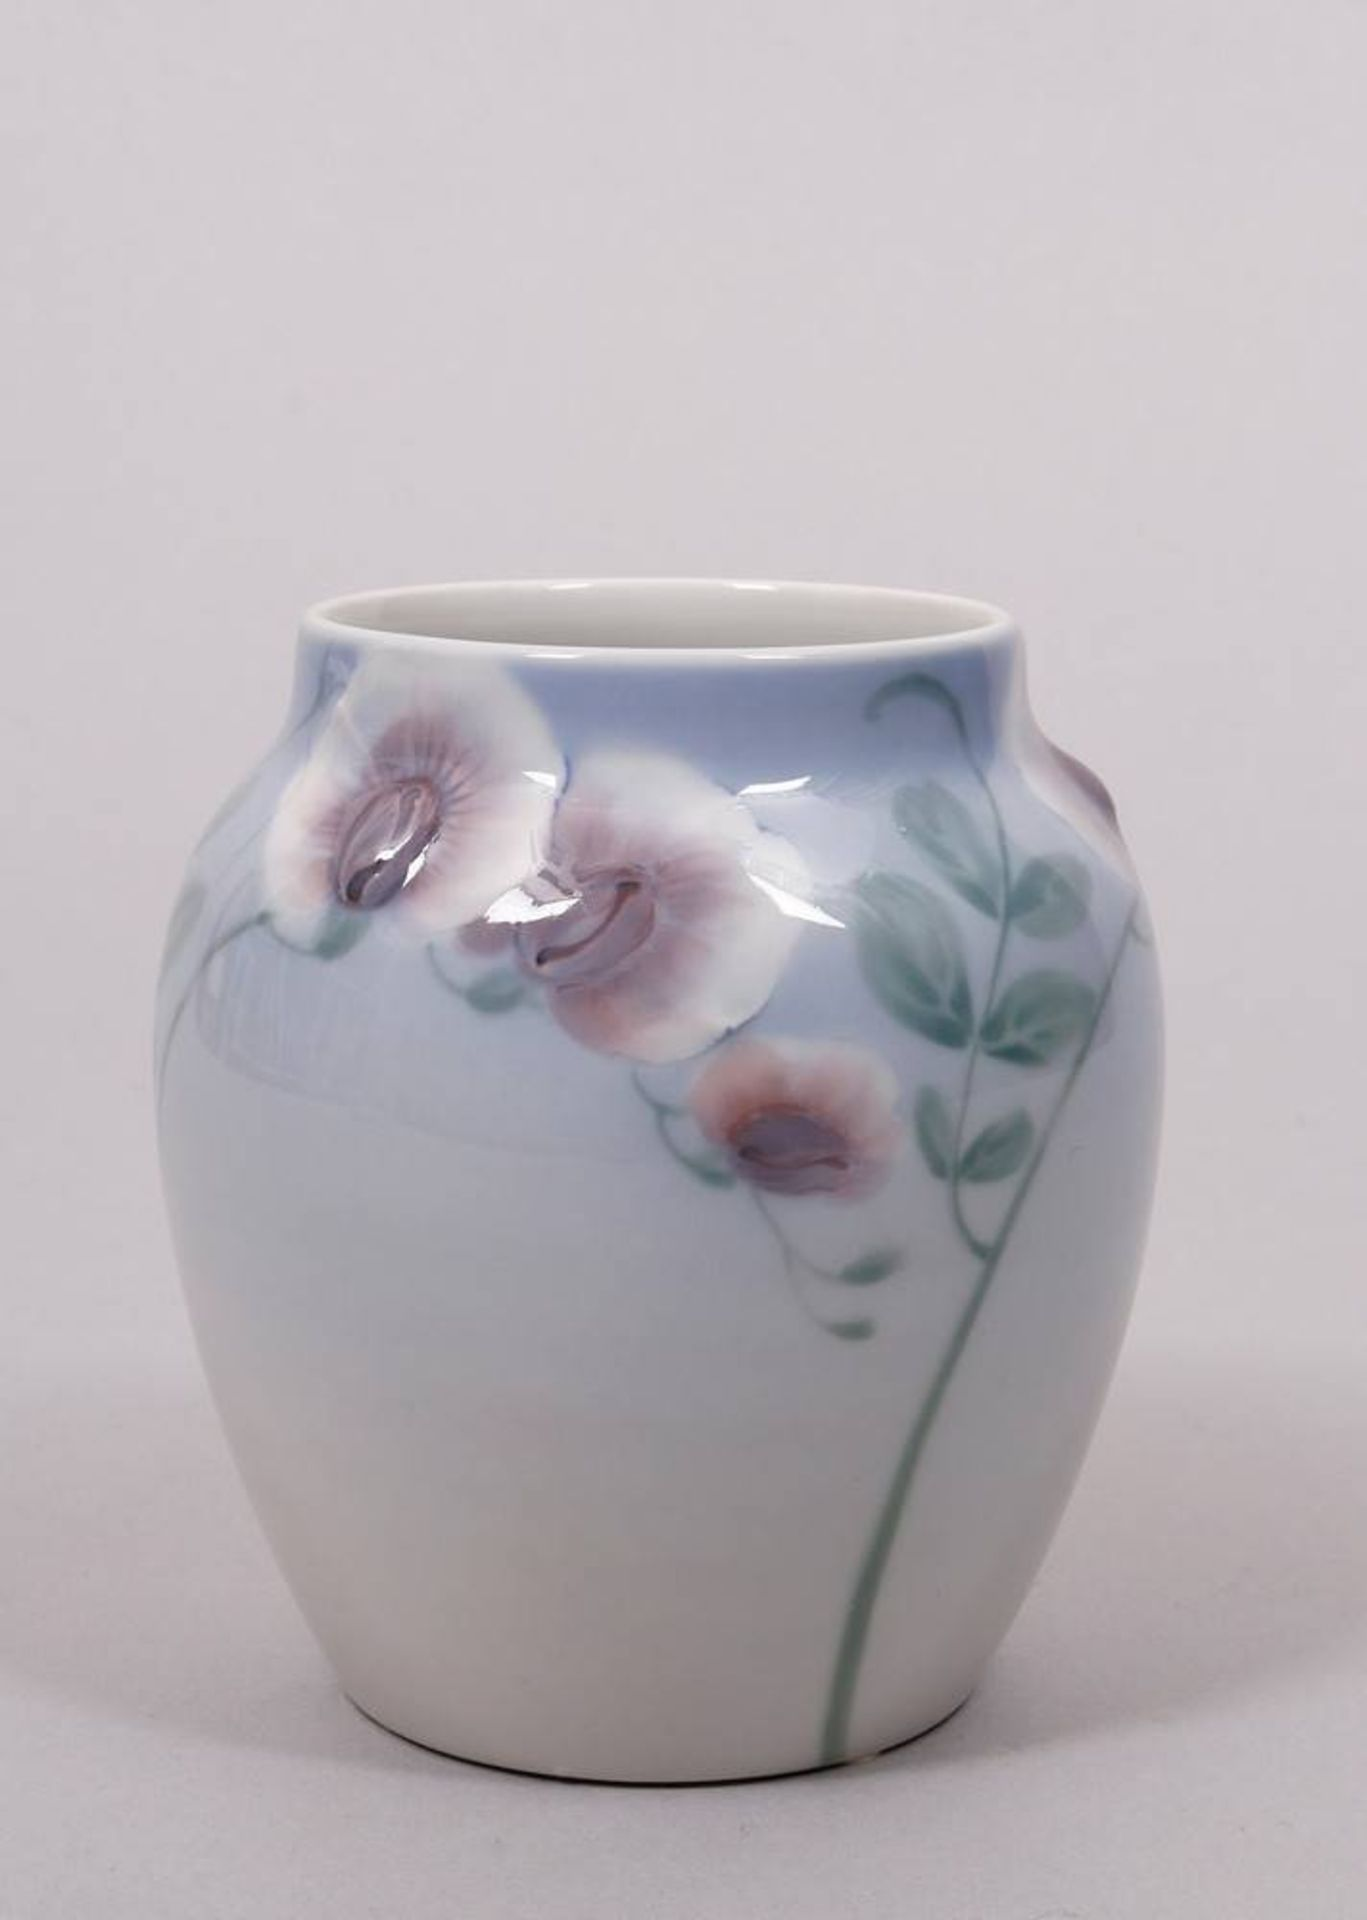 Small Art Nouveau vase, Rörstrand, ca. 1900 - Image 2 of 3